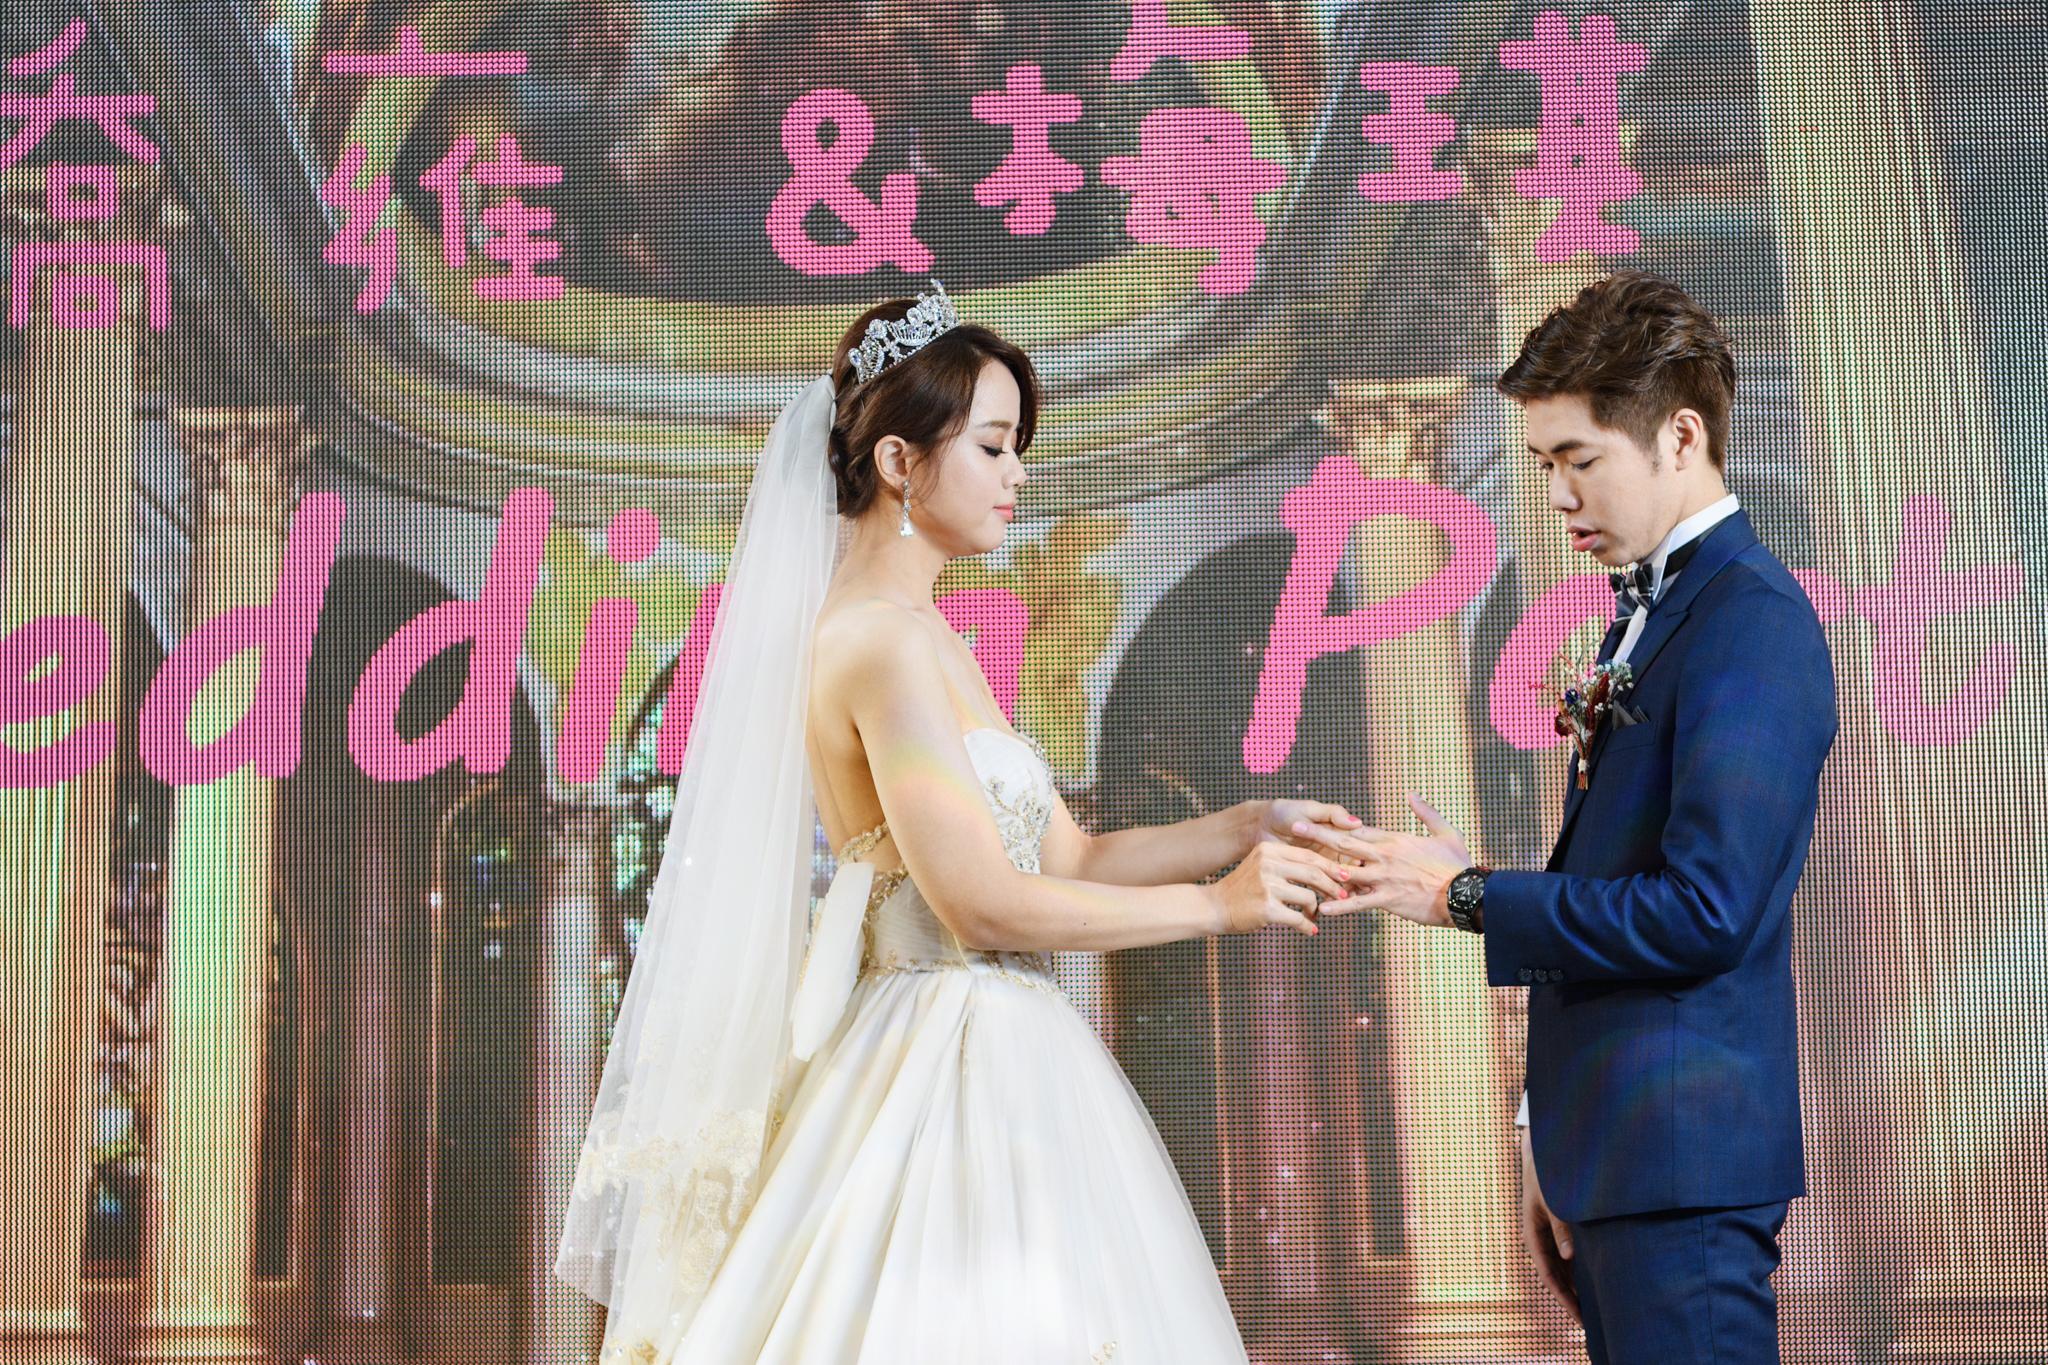 東法, 婚禮紀錄, 雙攝影師, 藝術婚禮, Donfer, Donfer Photography, EASTERN WEDDING, Wedding Day